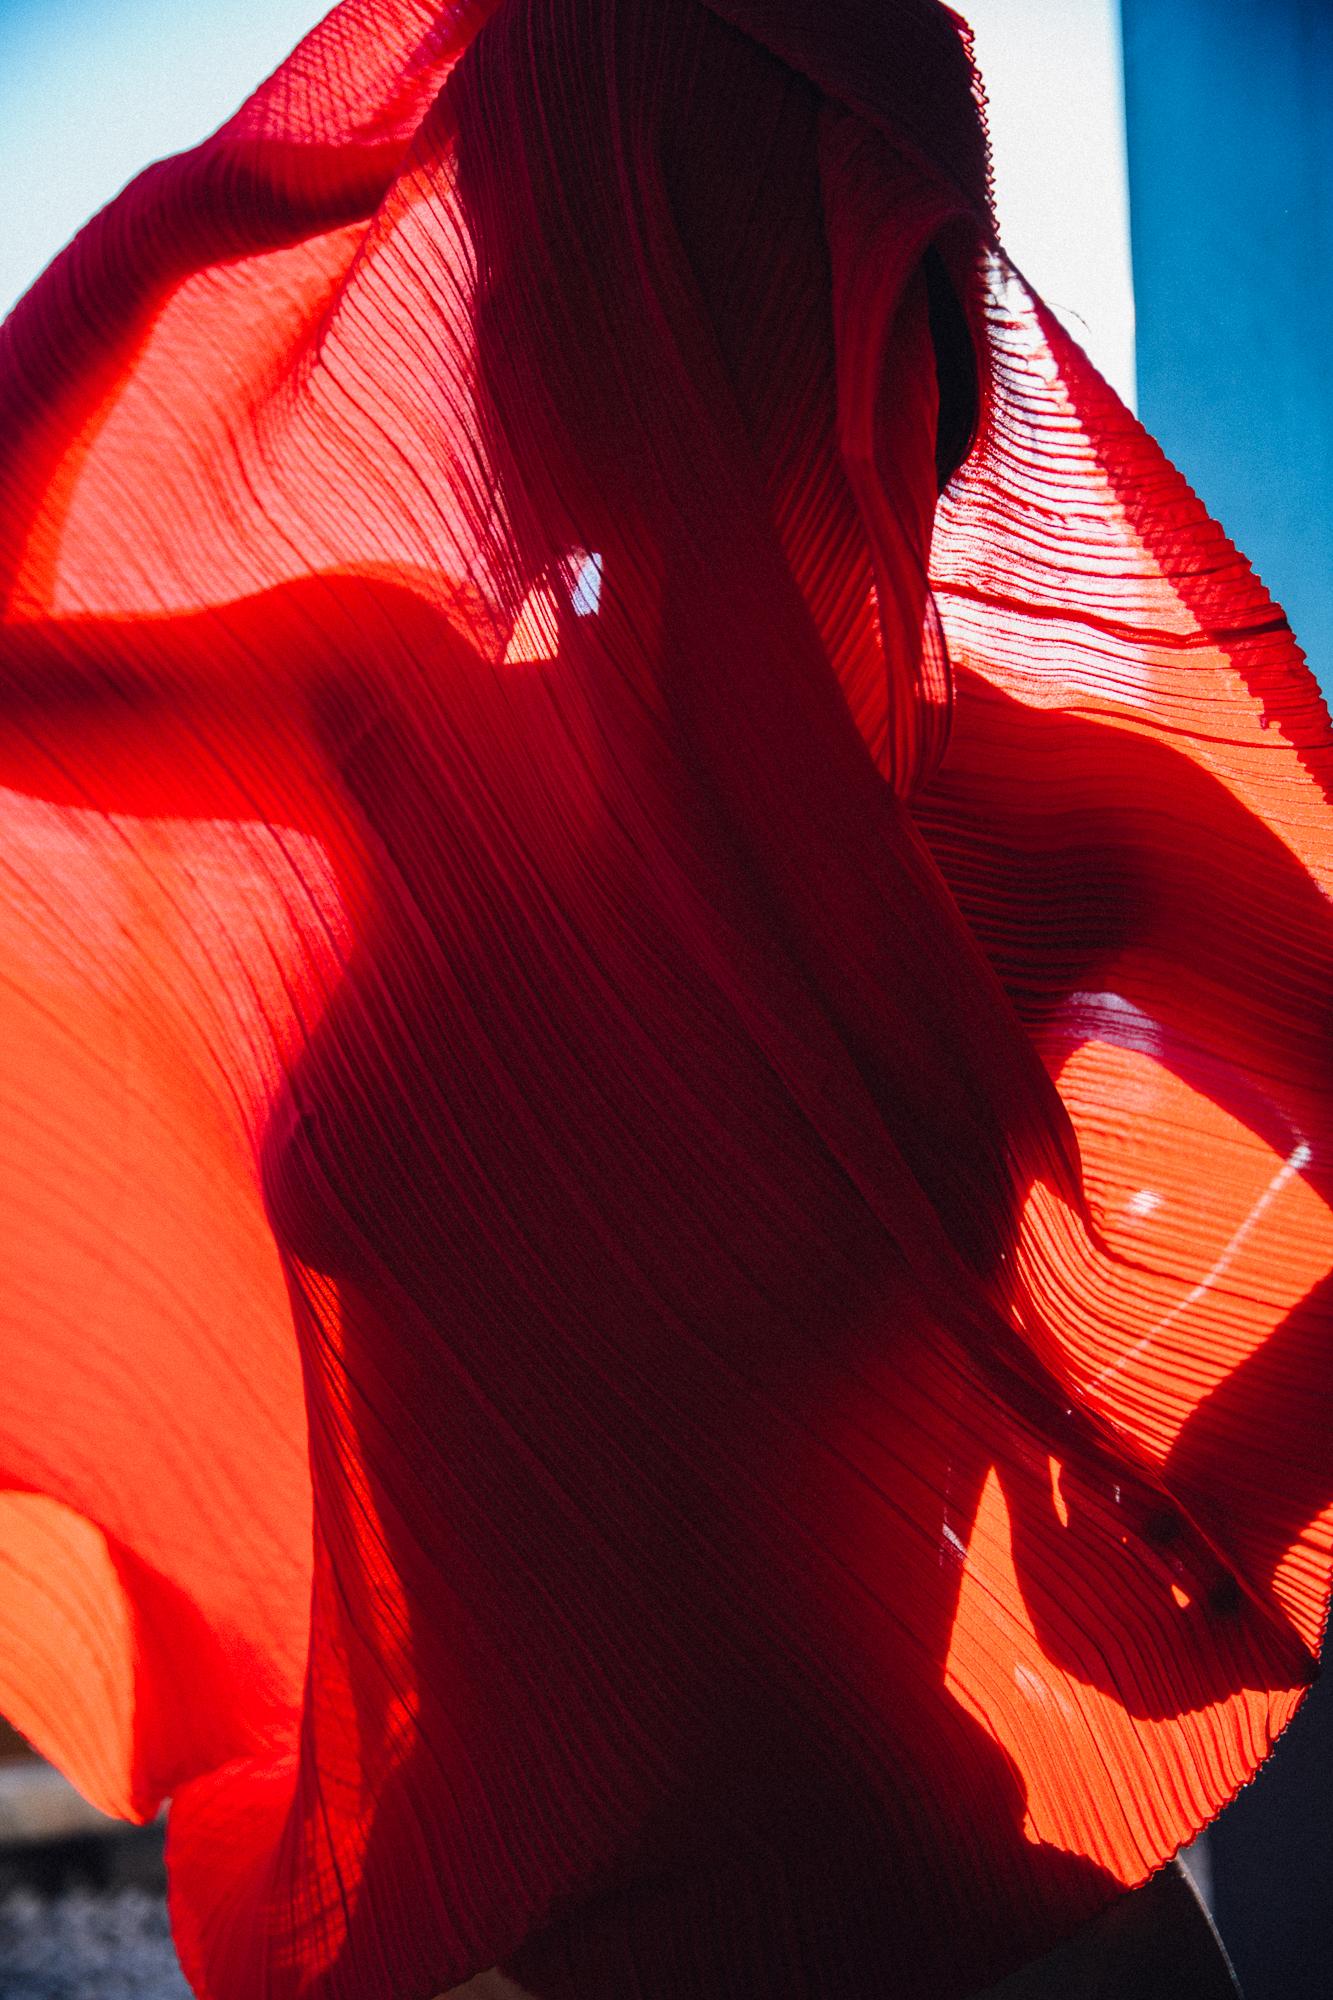 Aching | NYC 2015 | Daniel N. Johnson Photography